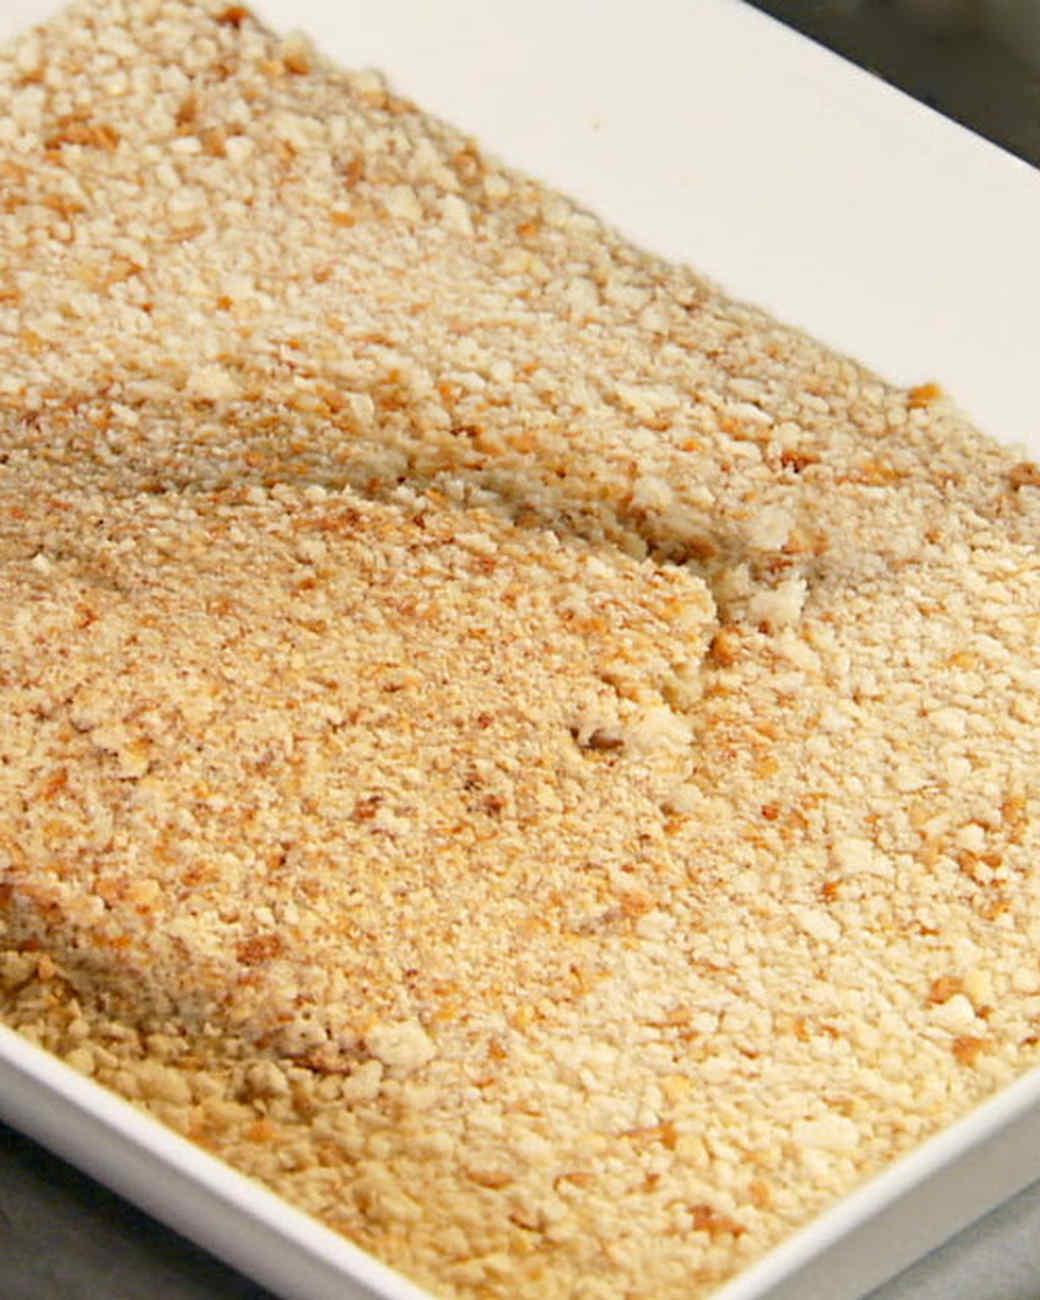 mh_1048_bread_crumbs.jpg